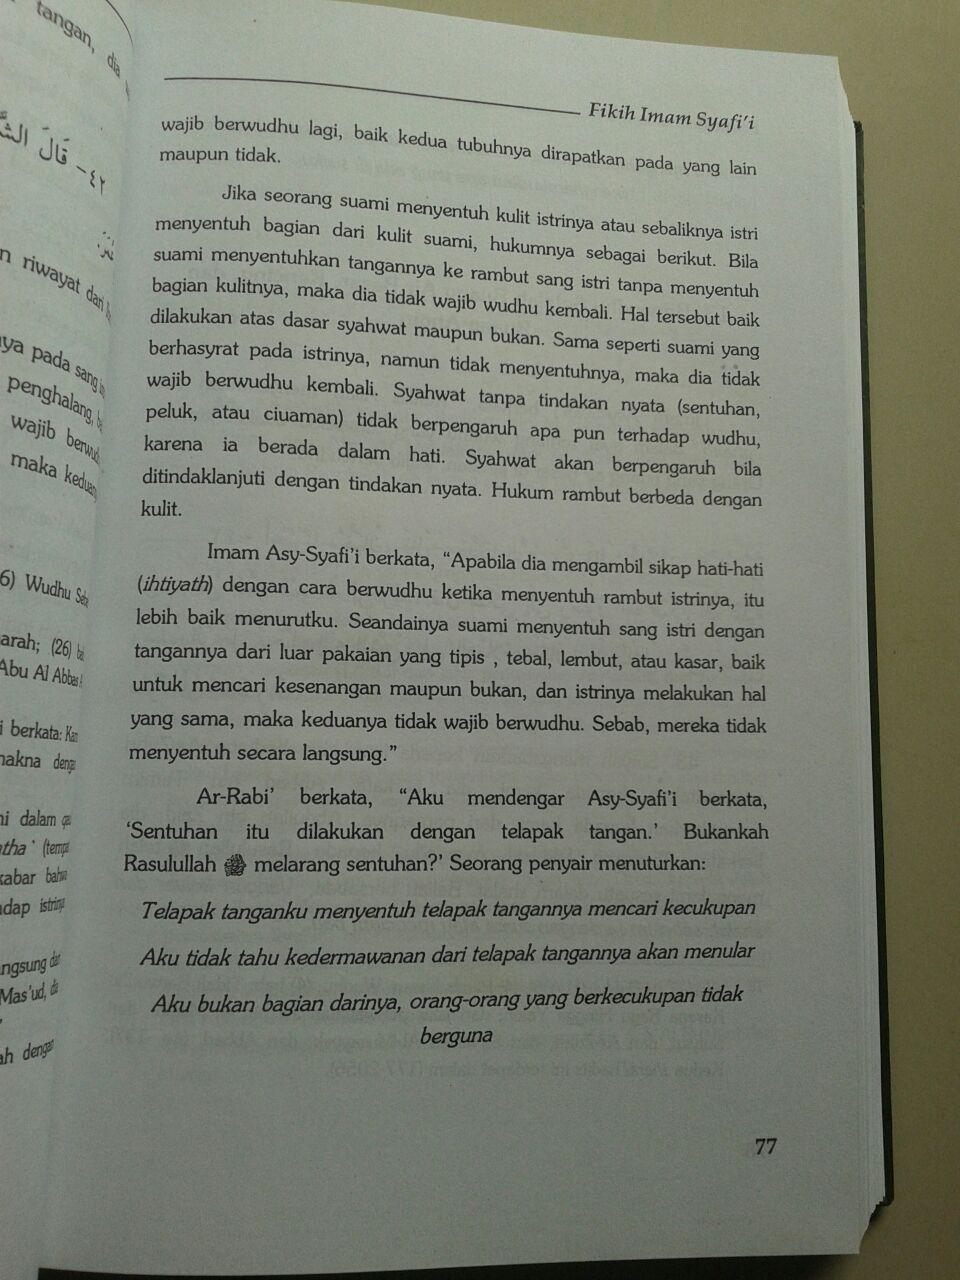 Buku Fikih Imam Syafi'i 1 Set 4 Jilid isi 3